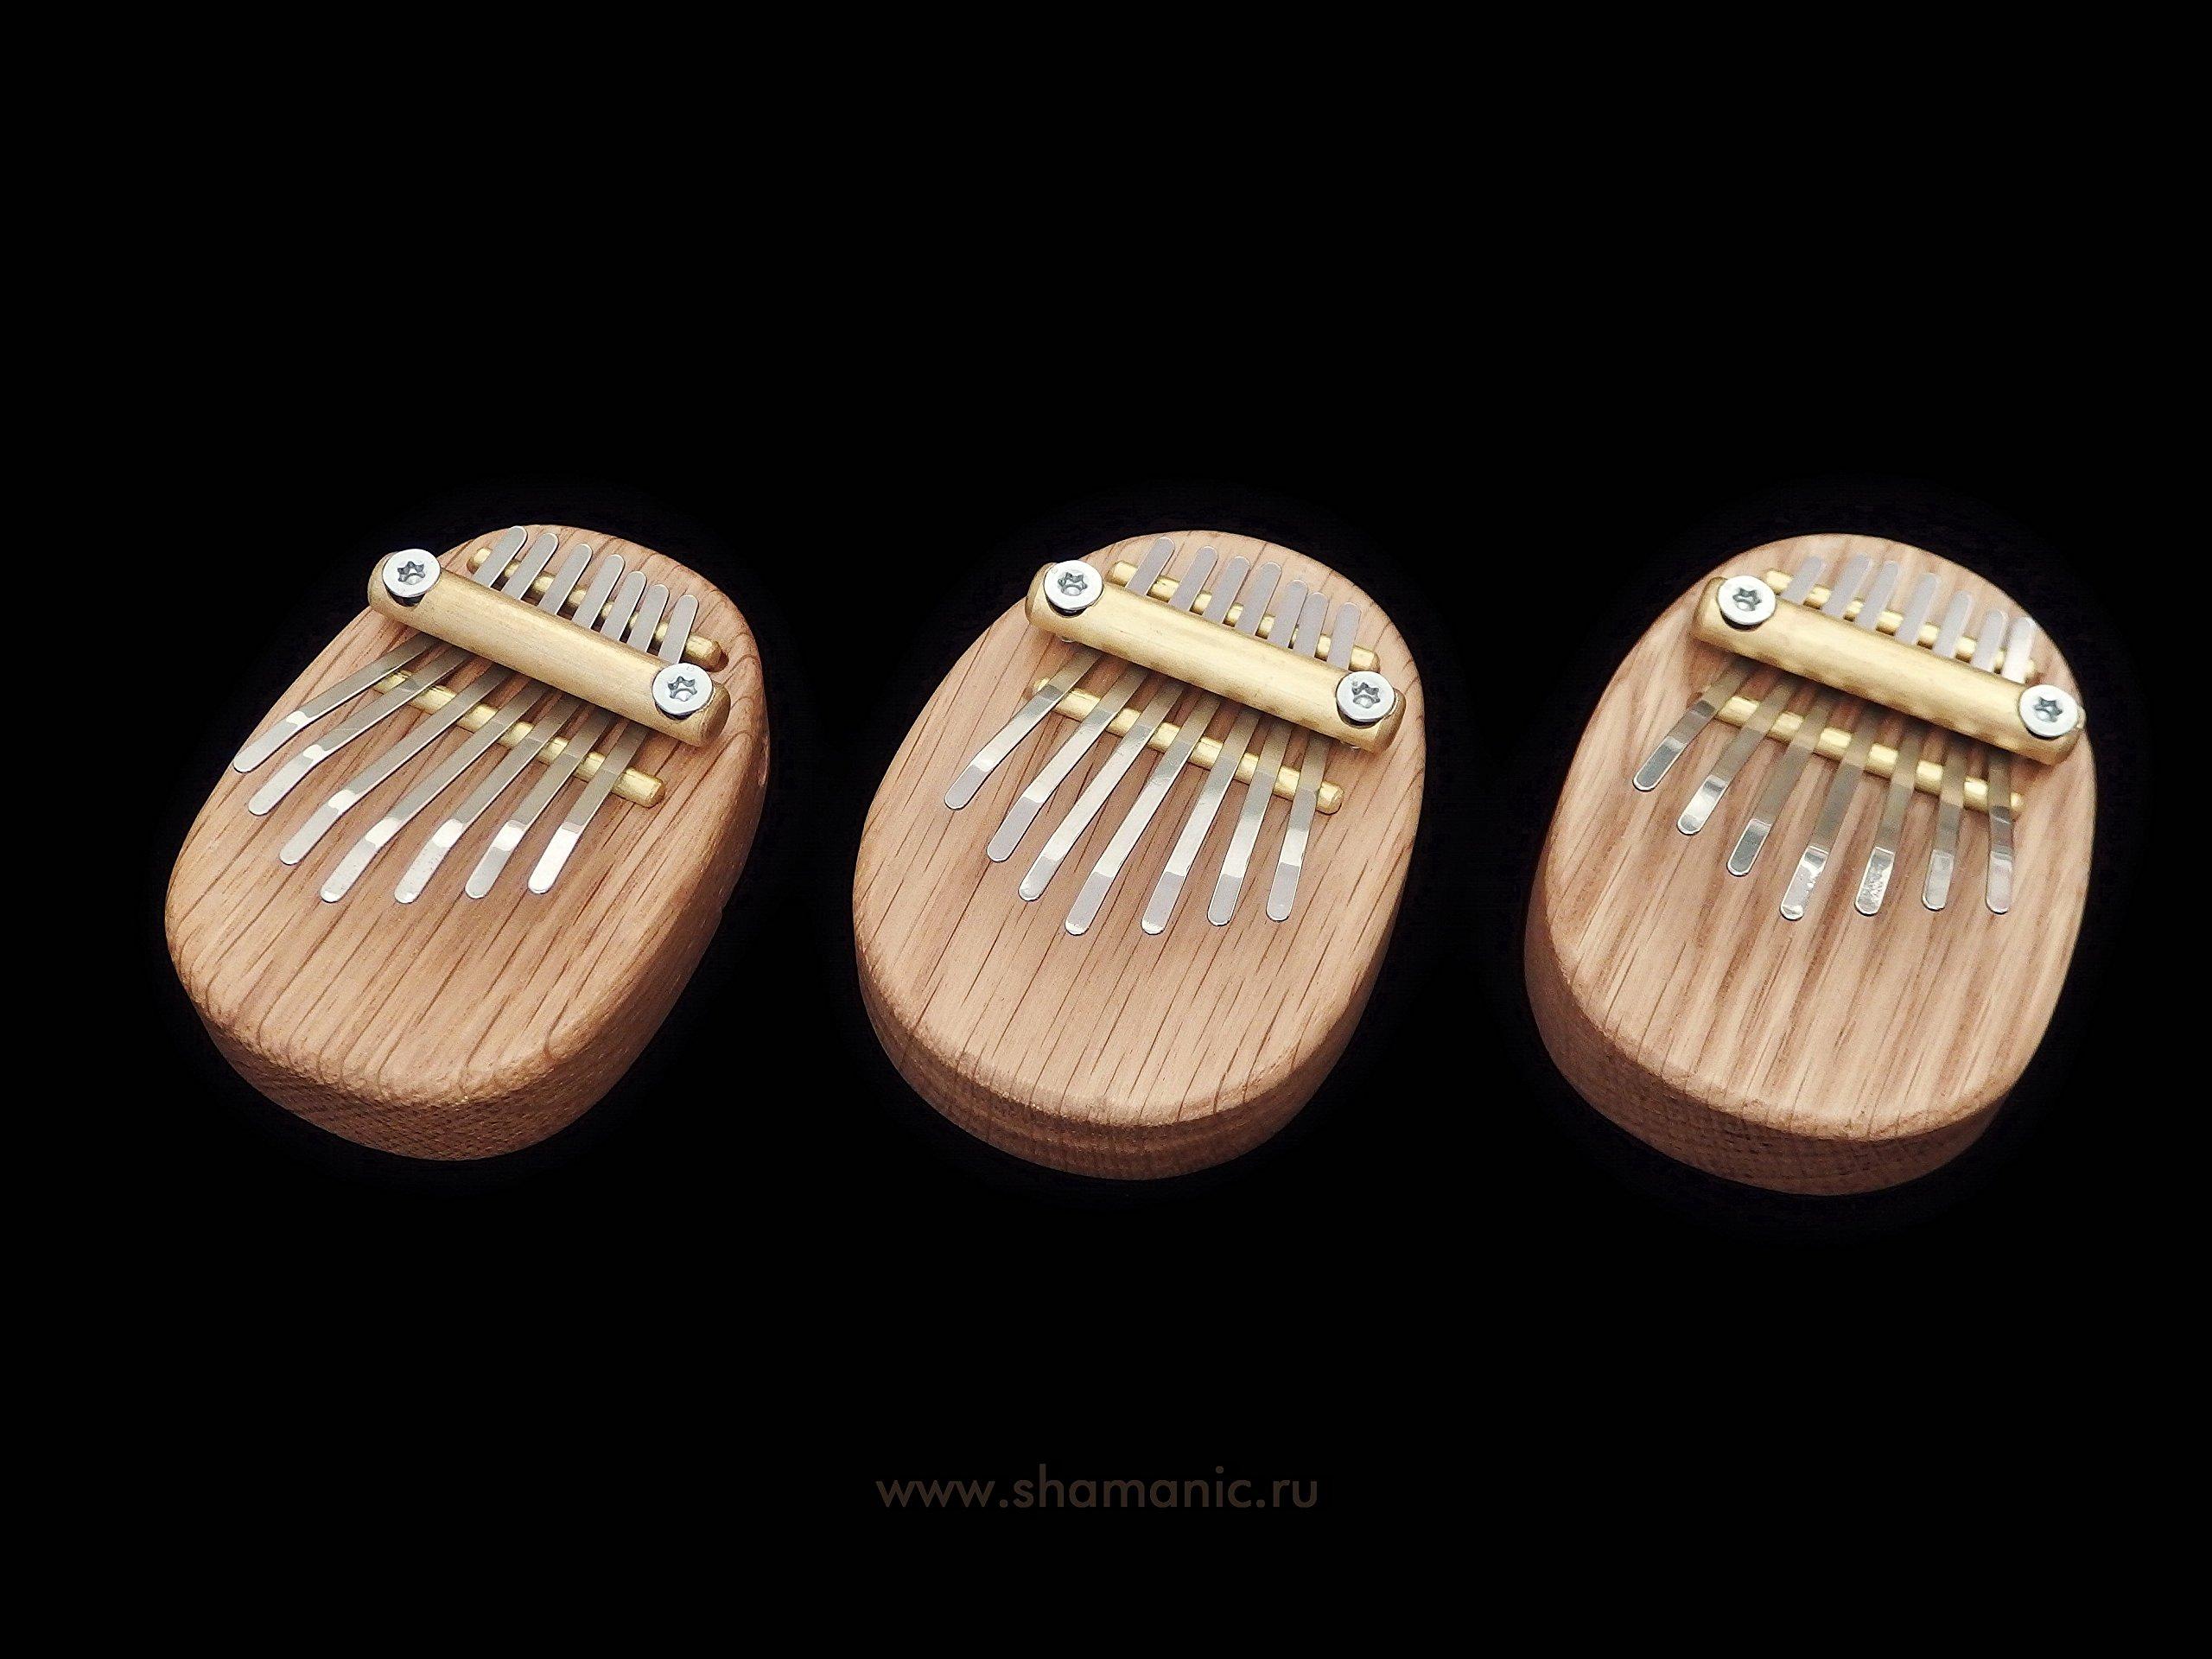 Kalimba Shamanic Mini (in case) Sansula Thumb Piano Great sound by Shamanicshop (Image #8)